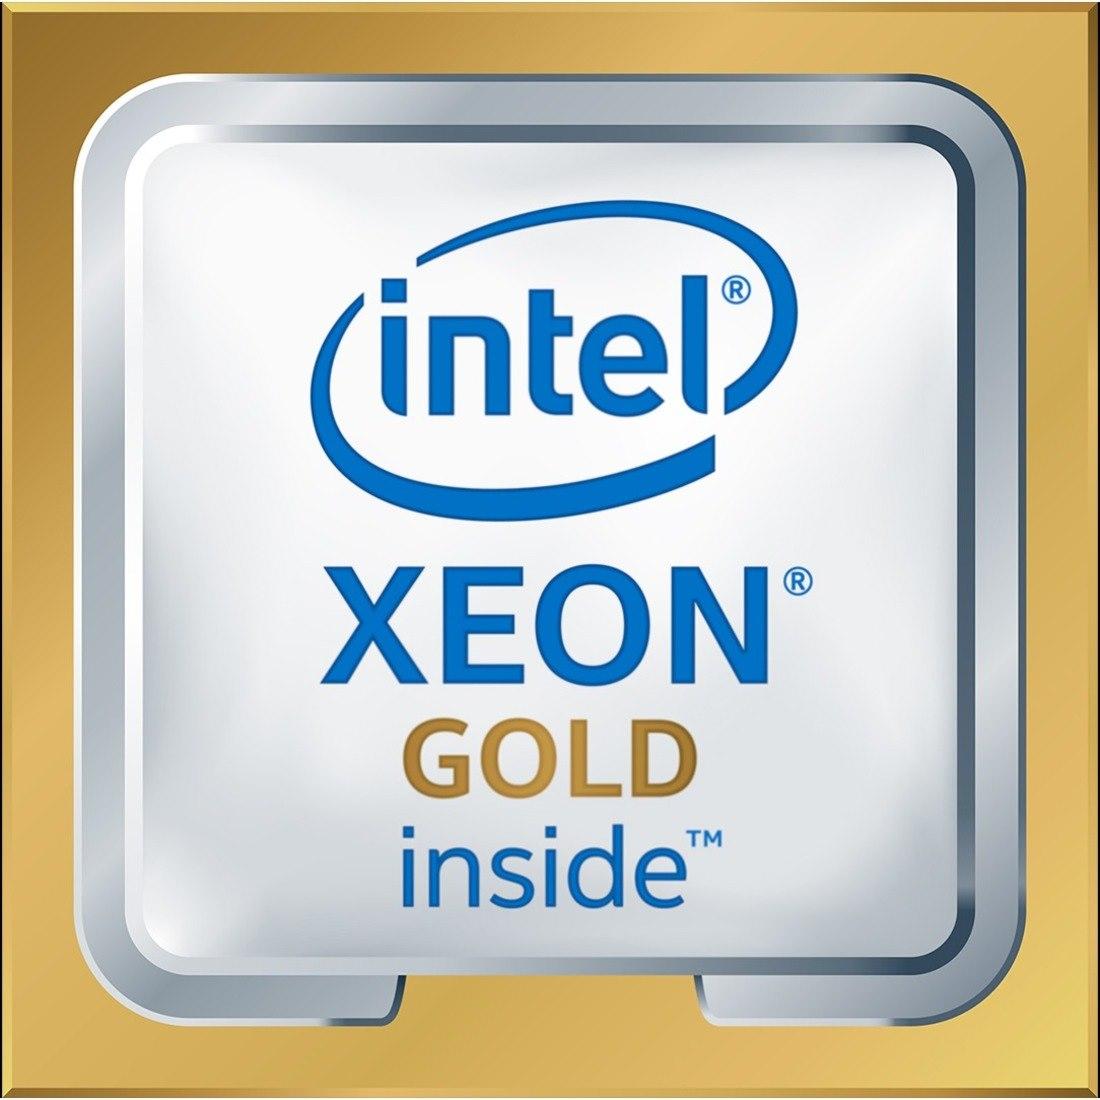 HPE Intel Xeon Gold 5217 Octa-core (8 Core) 3 GHz Processor Upgrade